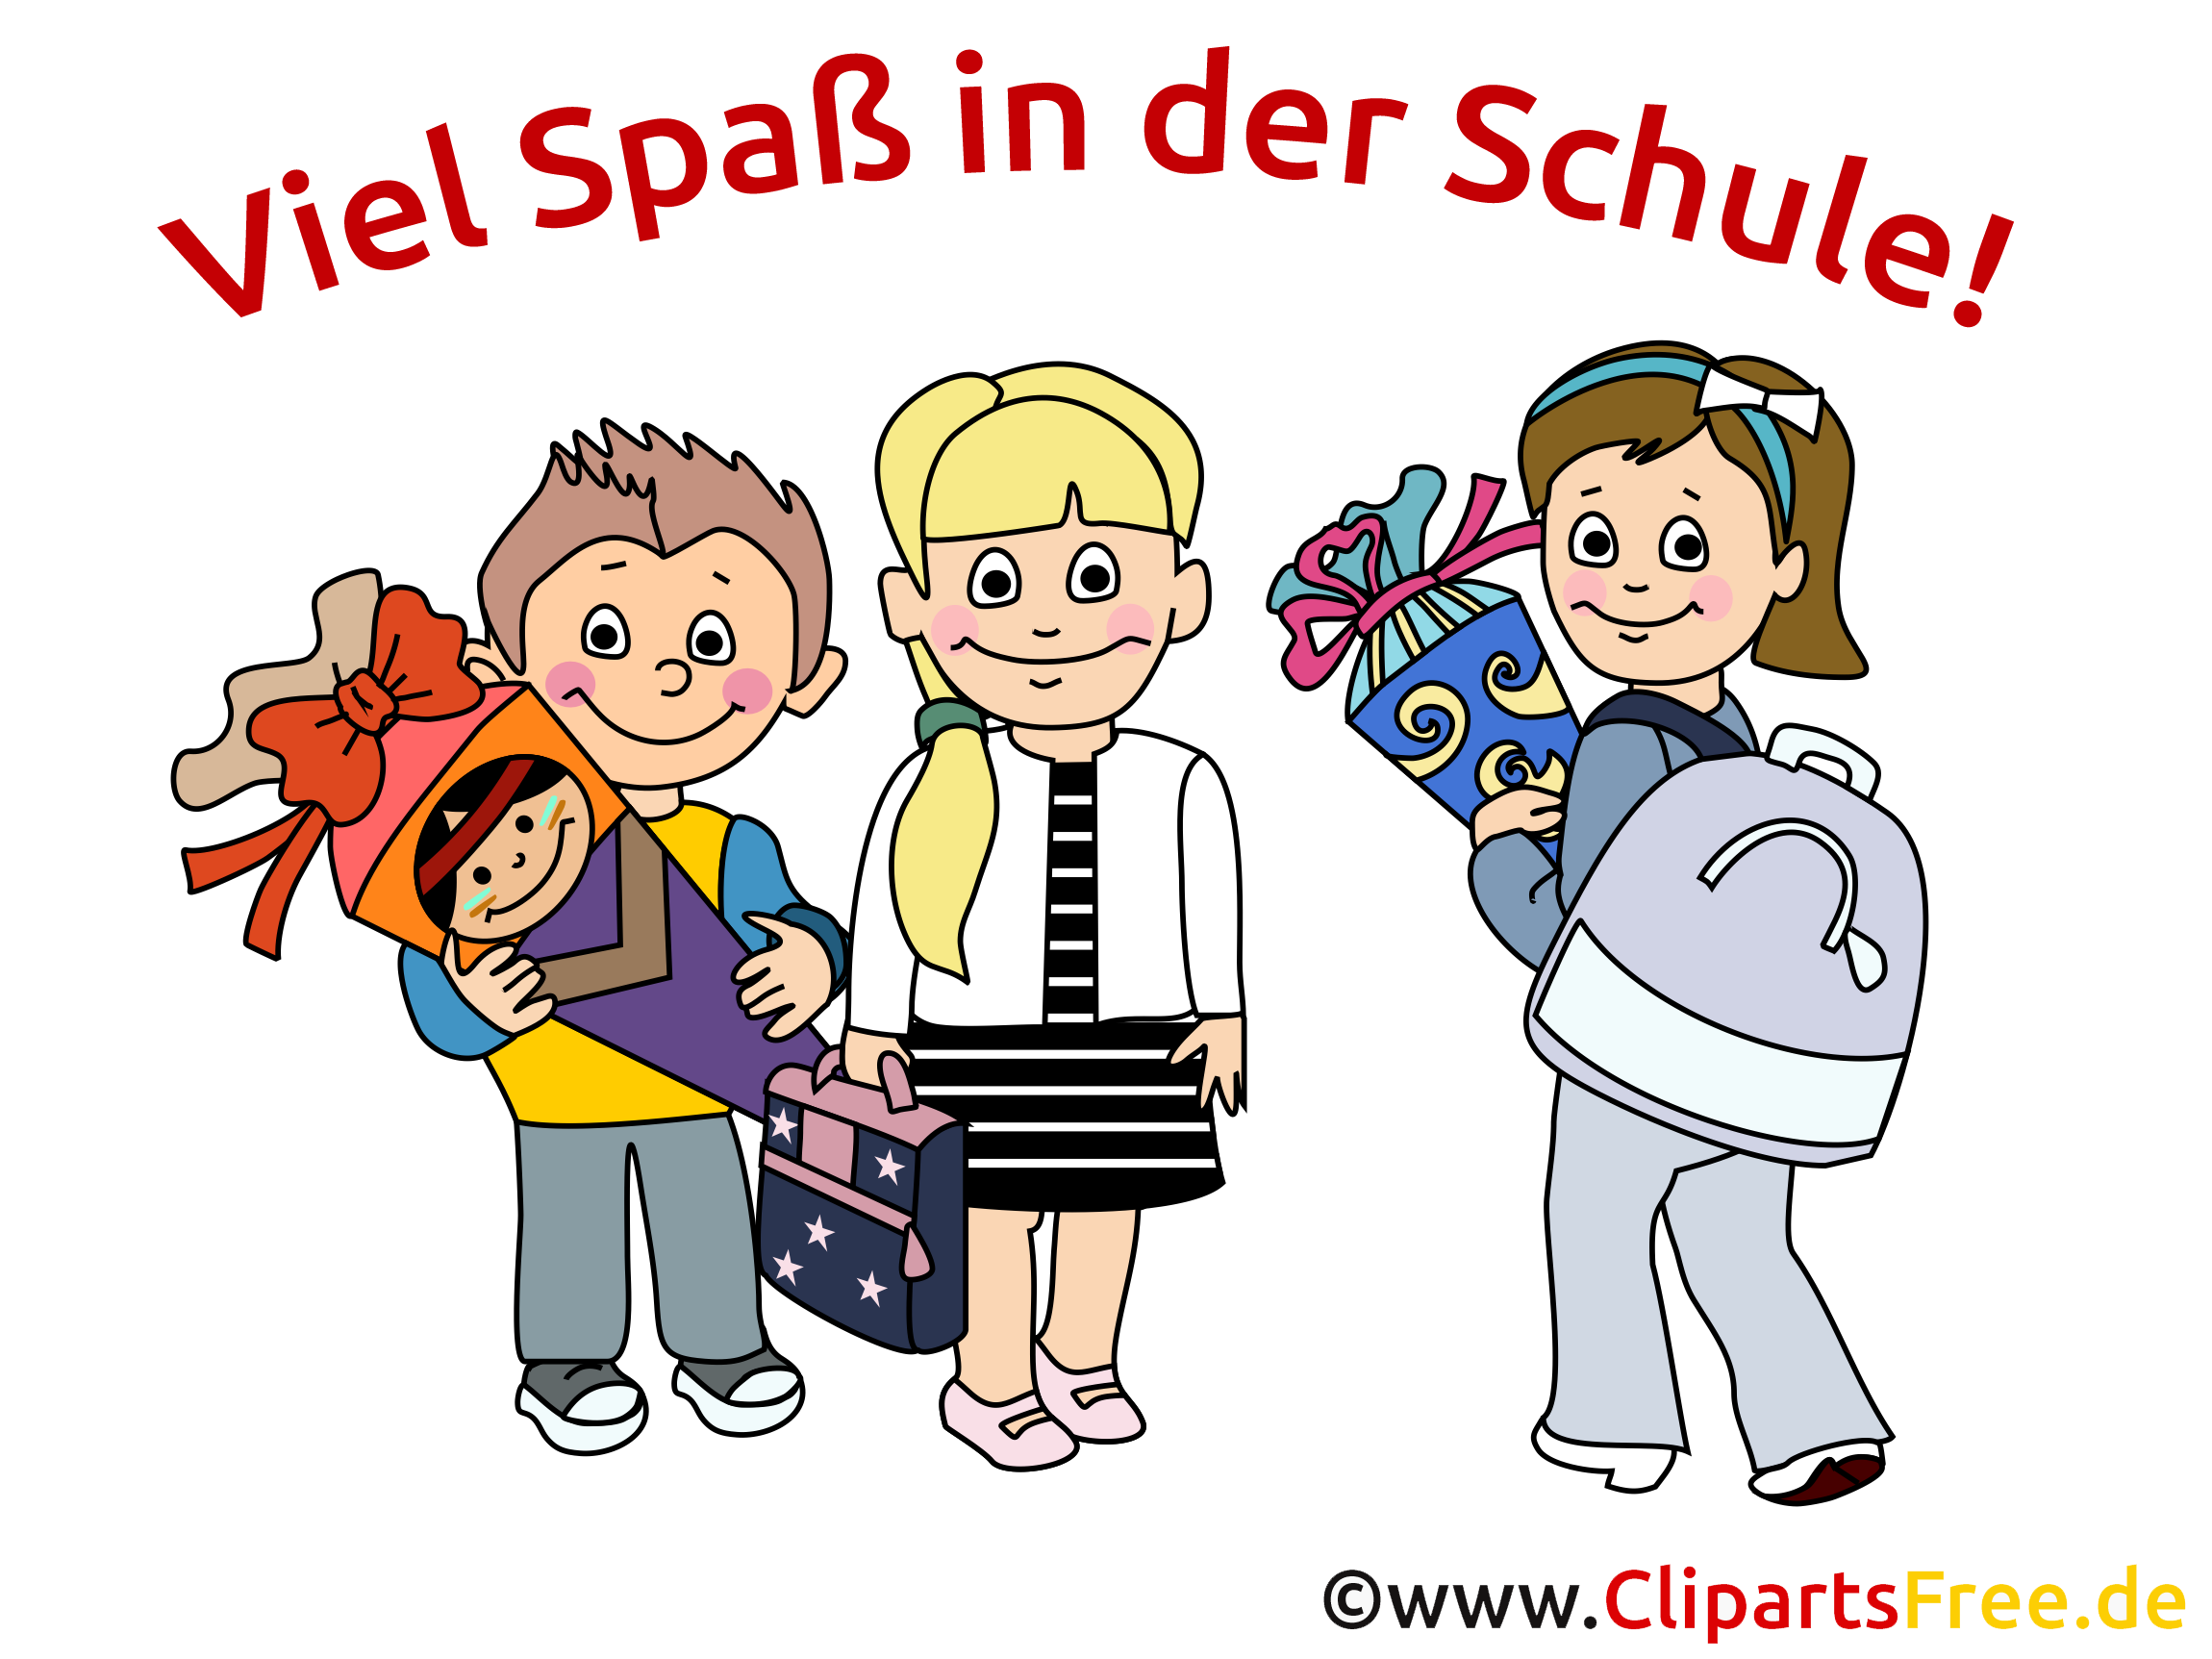 Schulanfang clipart kostenlos jpg freeuse download Sprüche zum Schulanfang jpg freeuse download